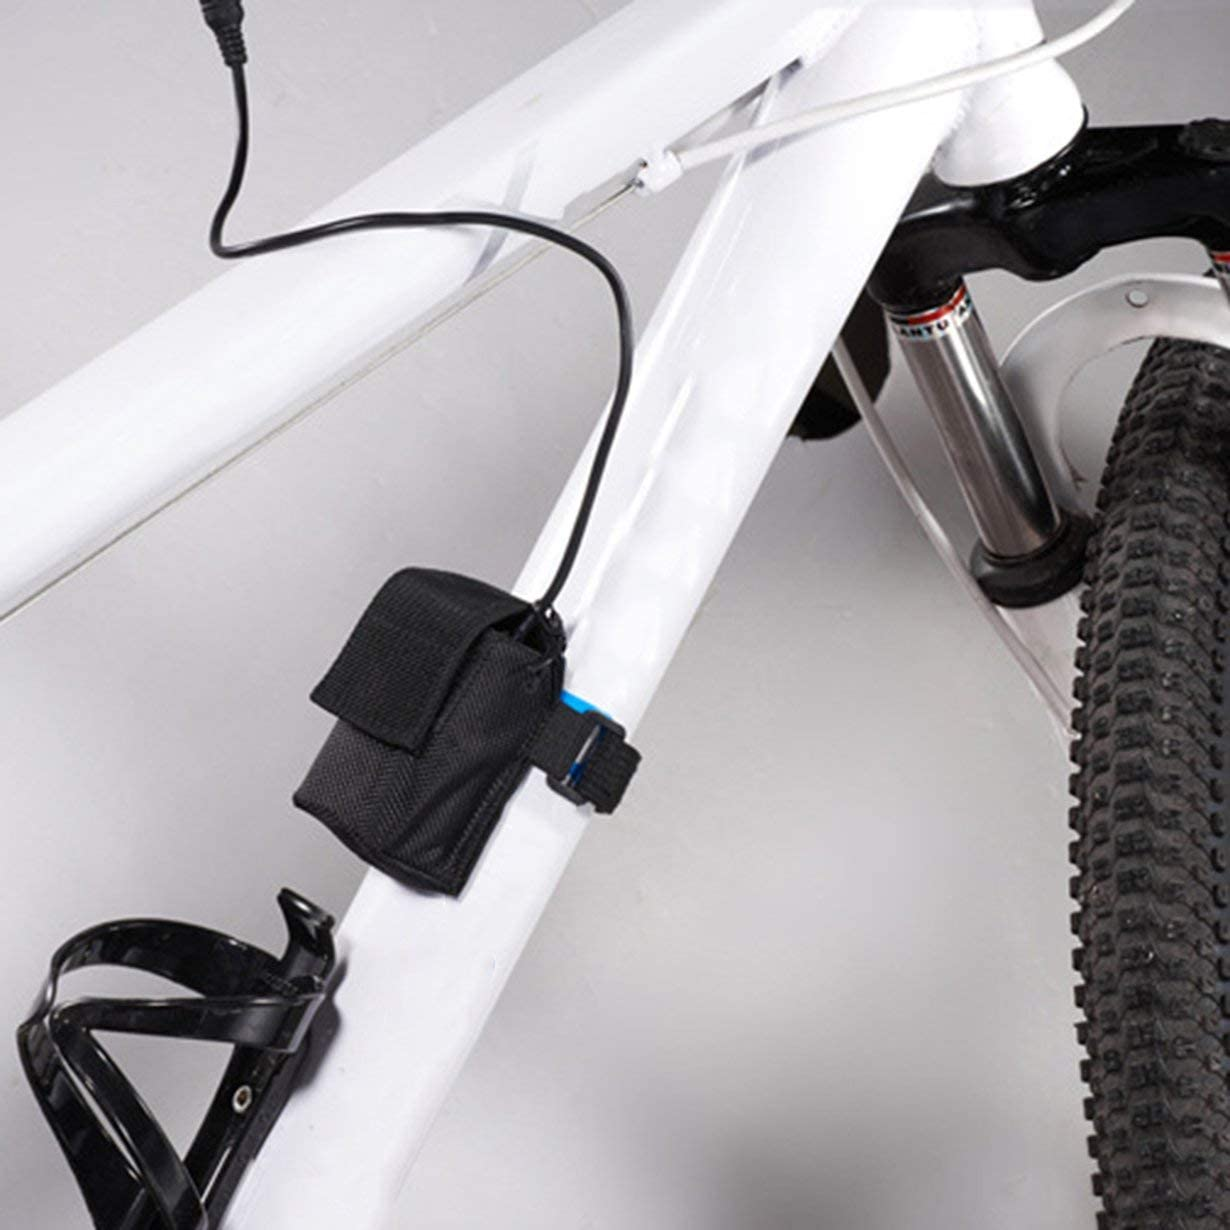 Batería recargable a prueba de agua con 6400mAh 4x18650 Para la luz para bicicle